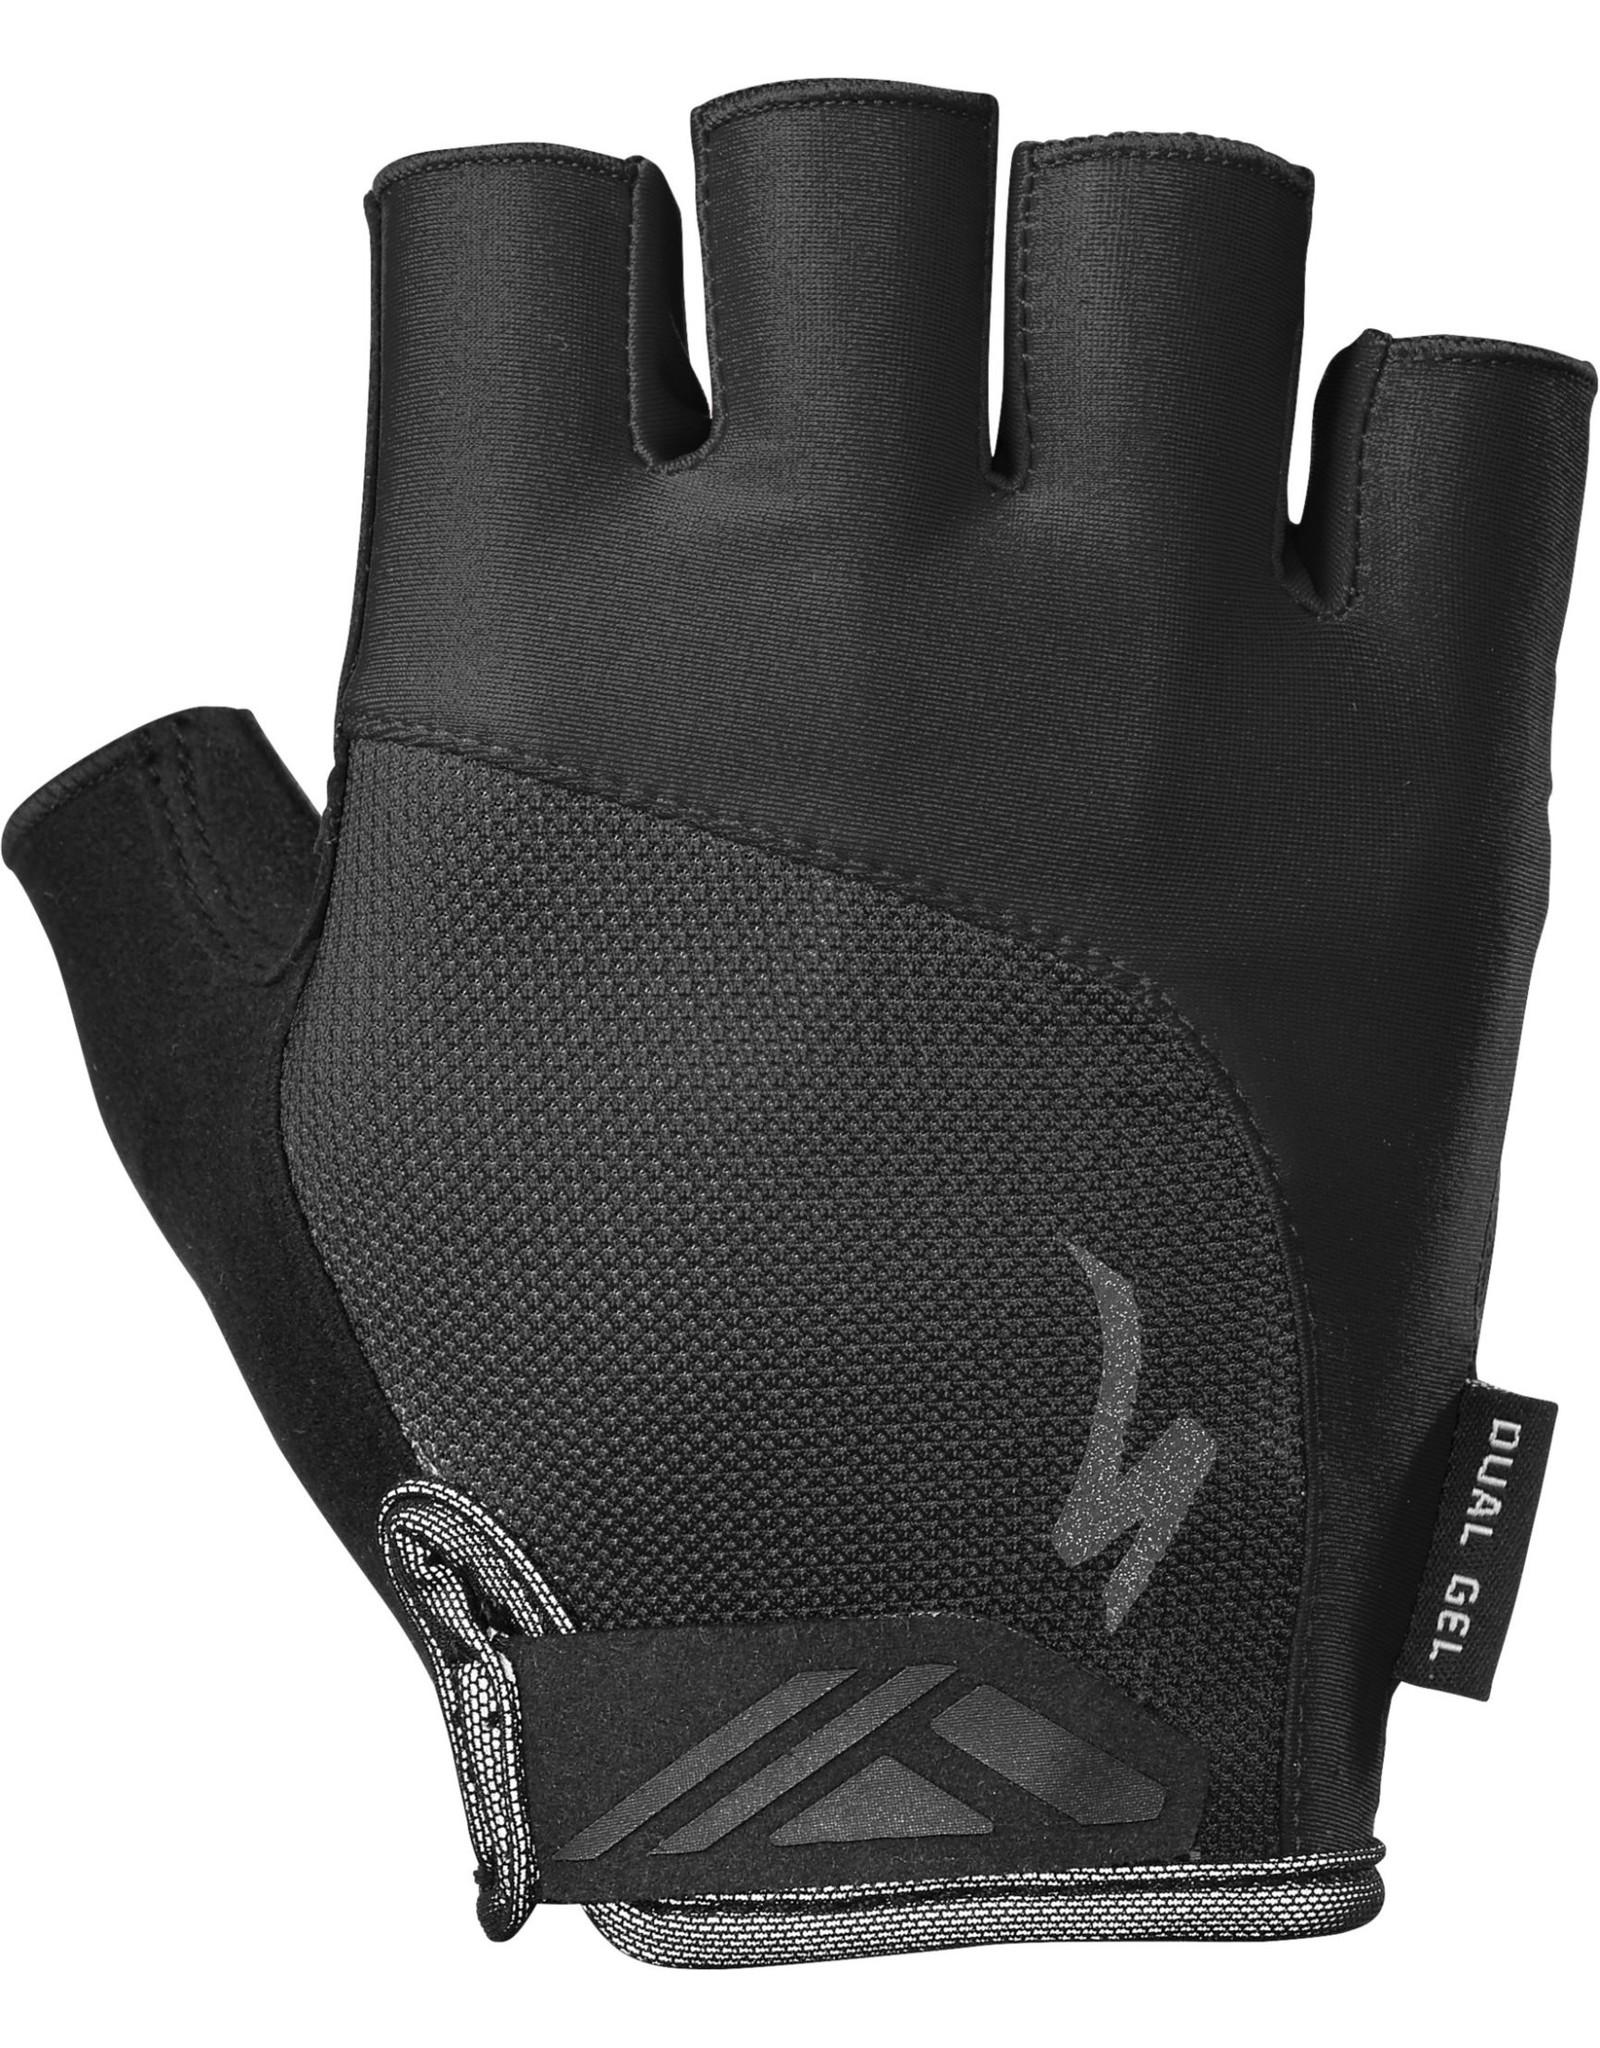 Specialized Glove Spec Dual Gel SF Blk Lg